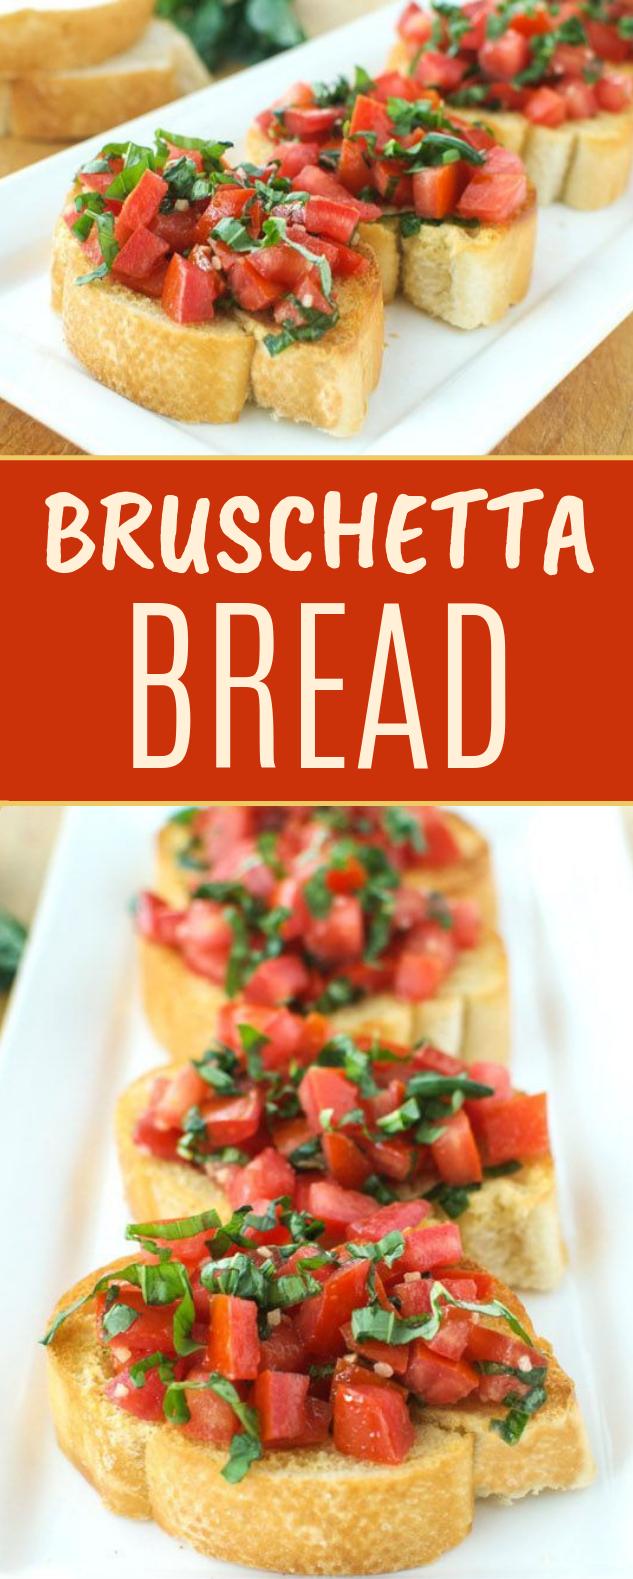 Bruschetta Bread #vegetarian #sidedish